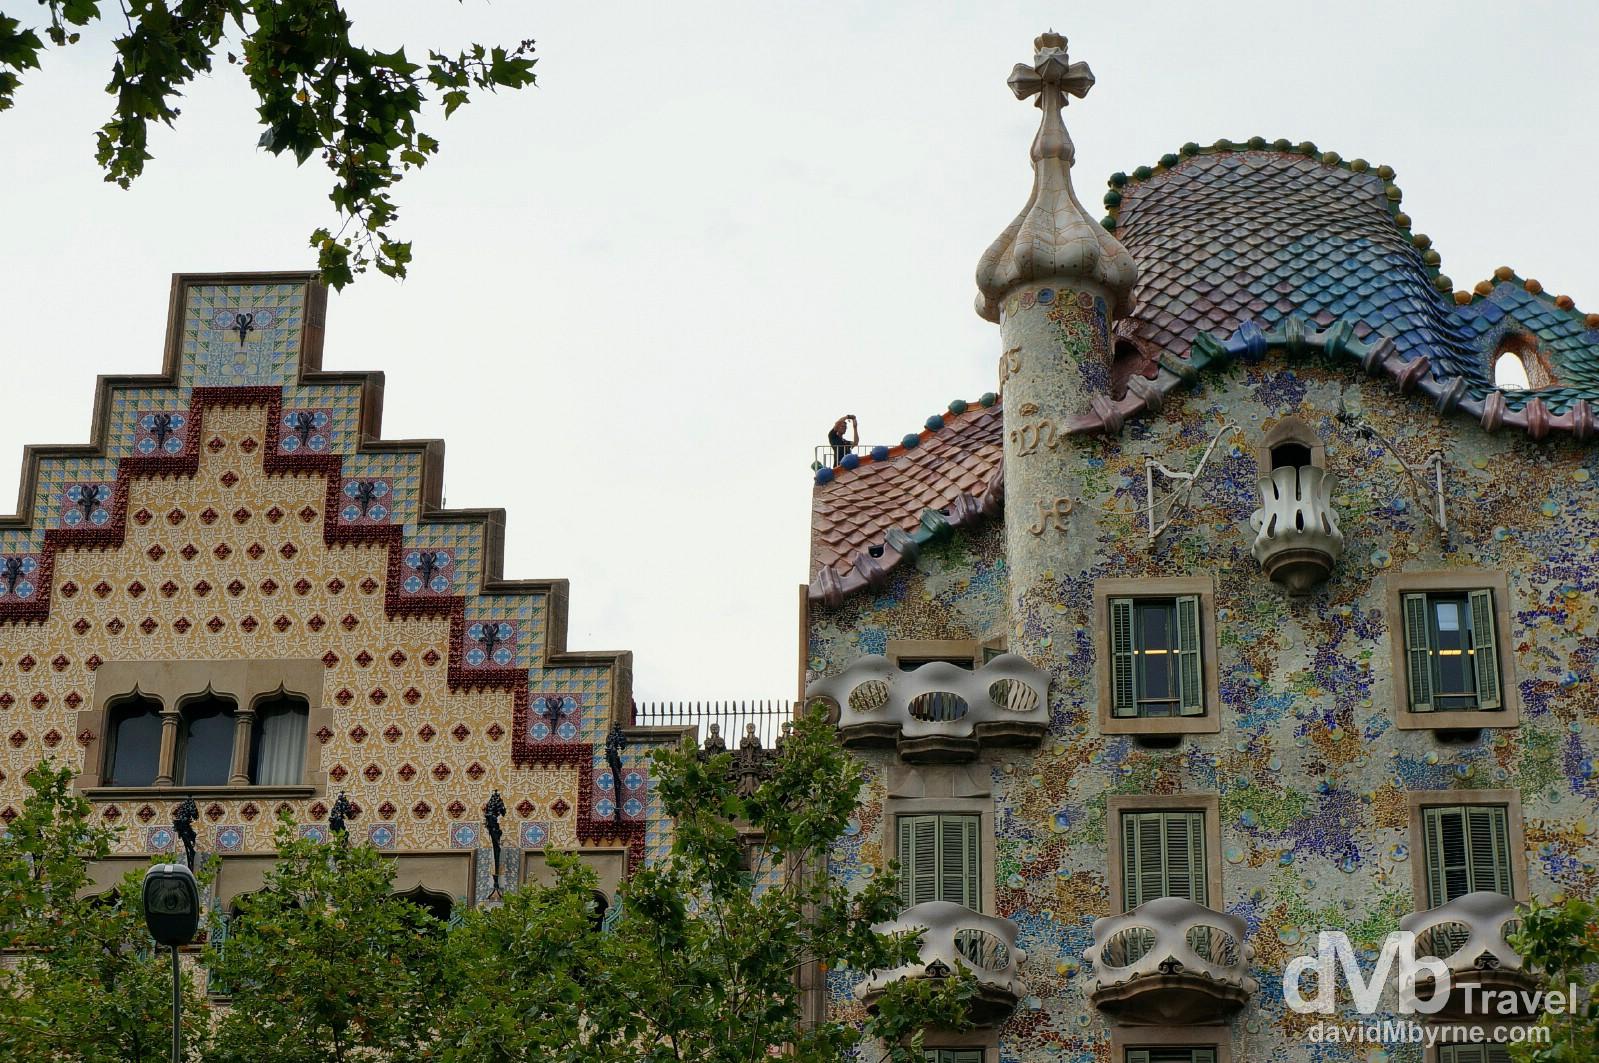 Gaudi's Casa Batilo (right) & Casa Amatller on Passeig de Gracia, Barcelona, Spain. June 17th, 2014.